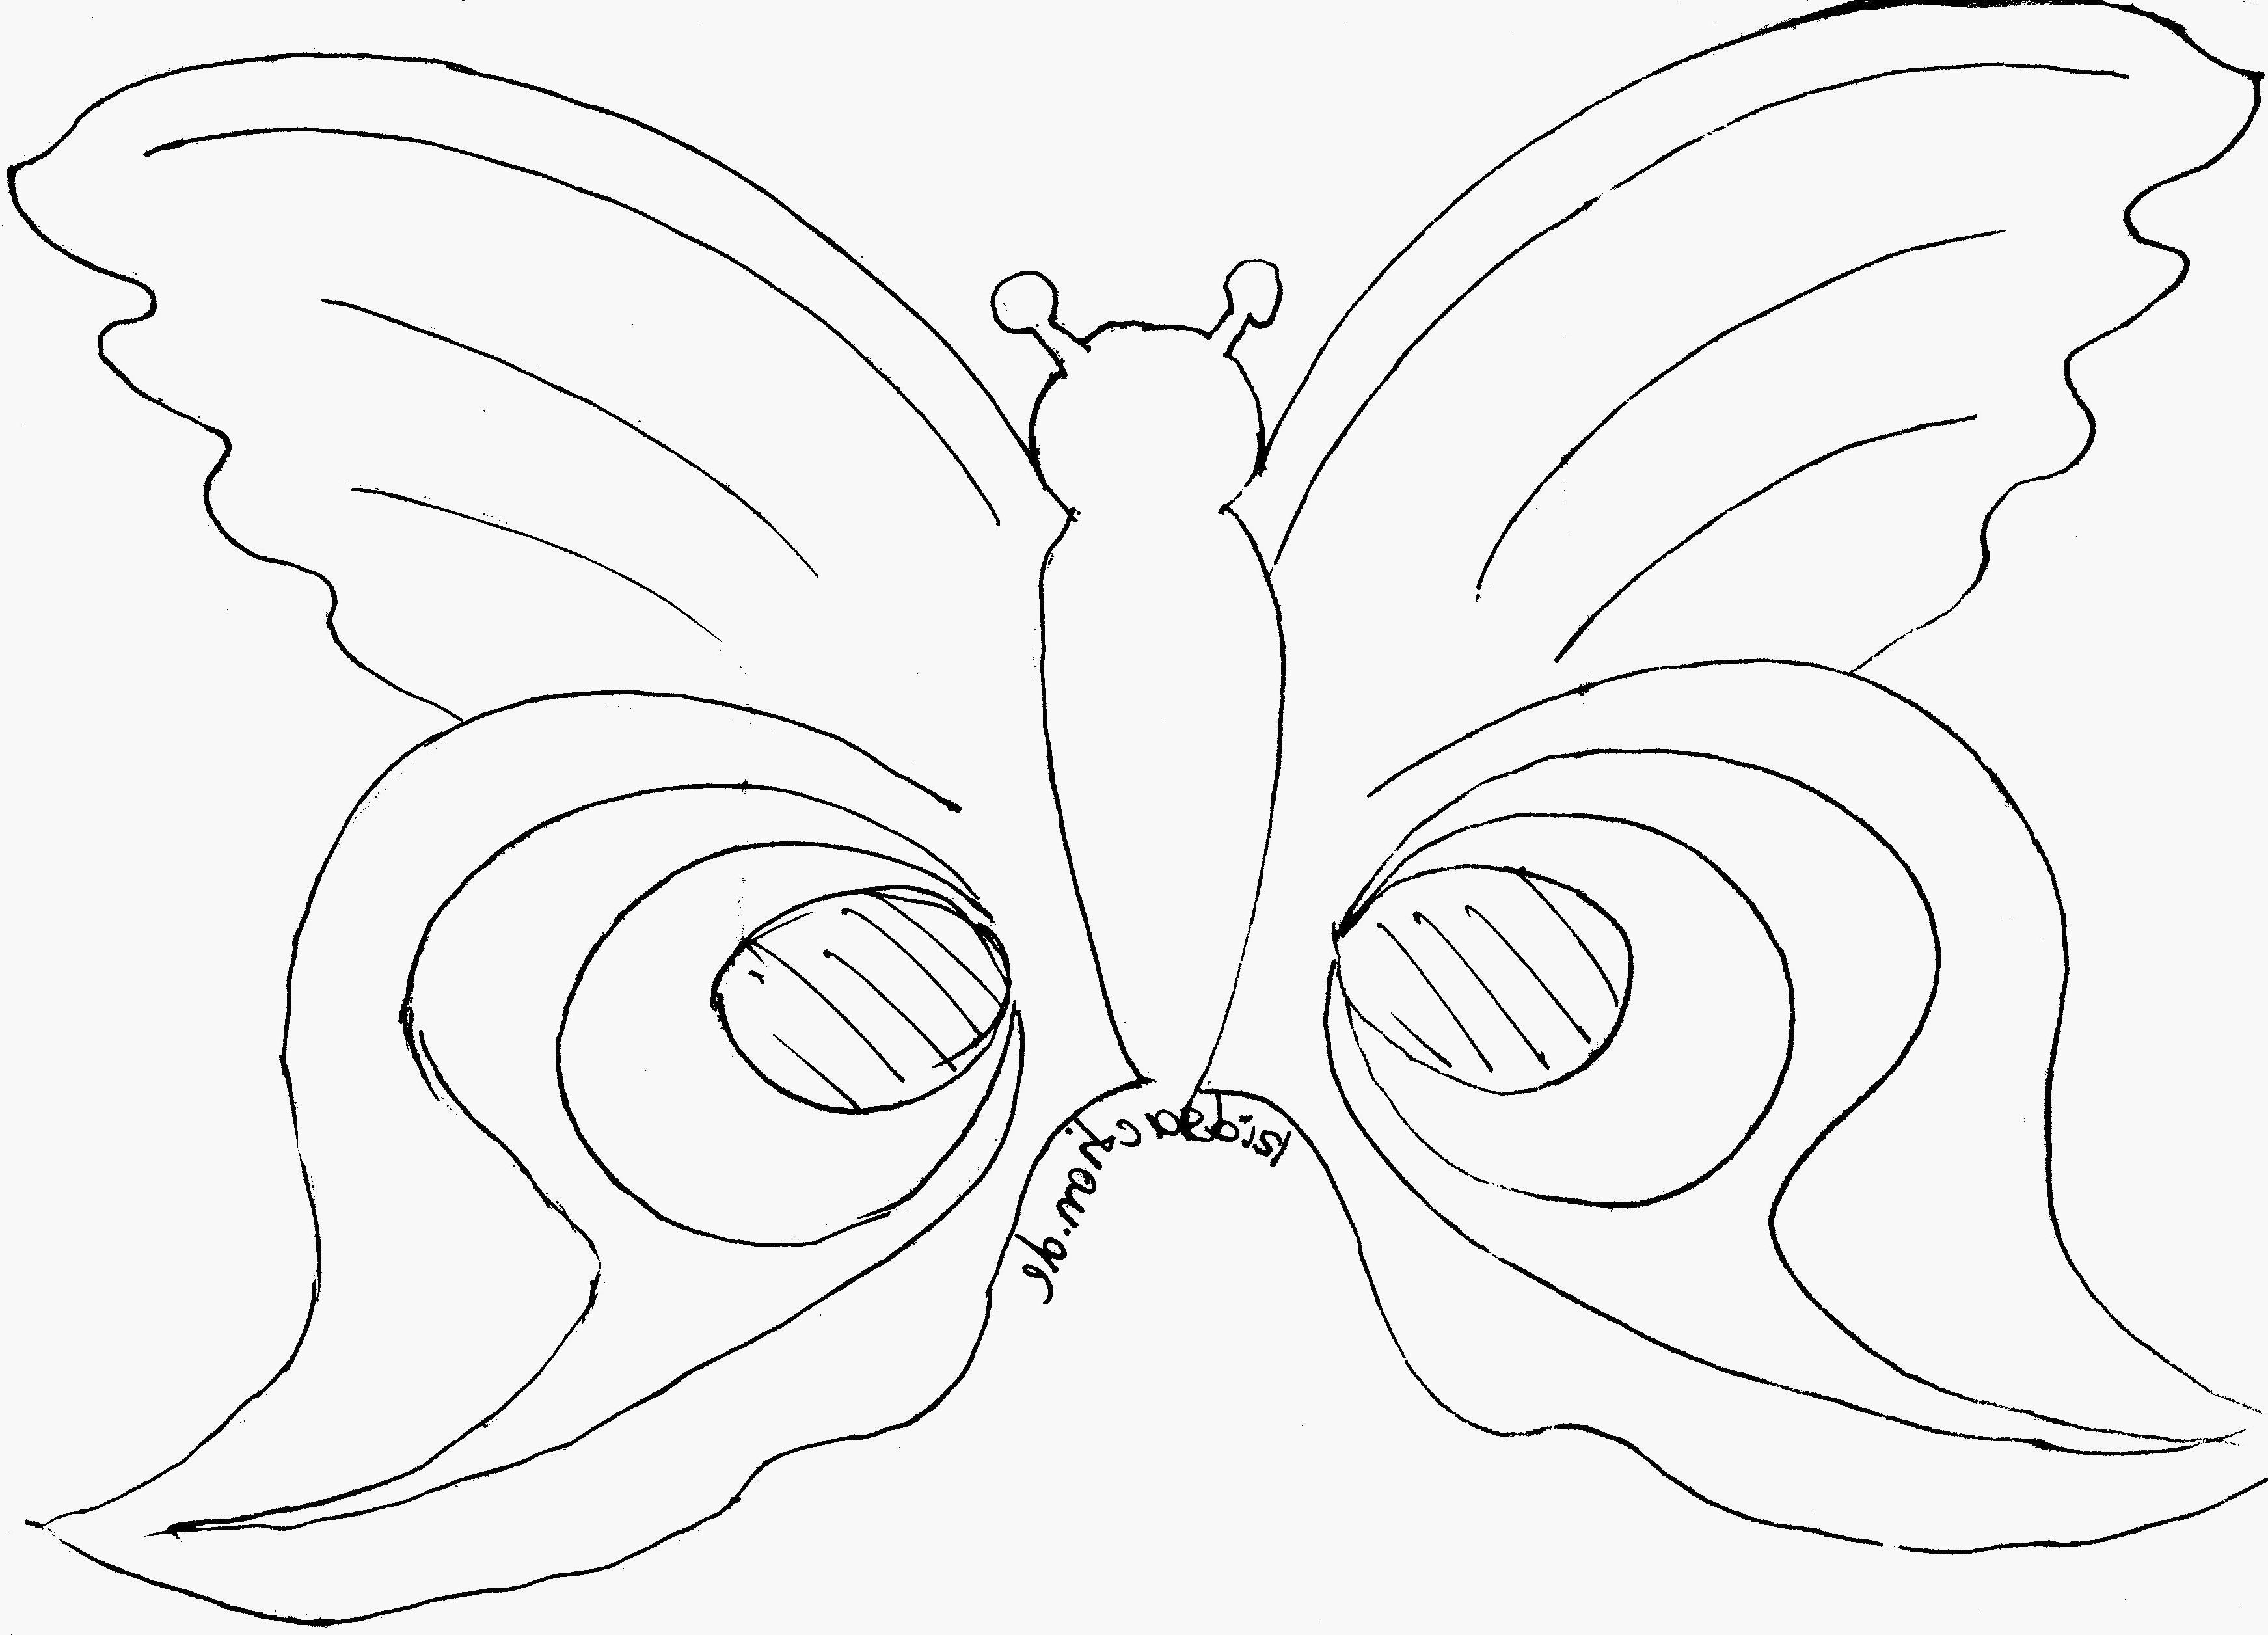 Mandalas Zum Ausmalen Schmetterling Einzigartig 22 Einzigartig Schmetterling Zum Ausmalen – Malvorlagen Ideen Bild